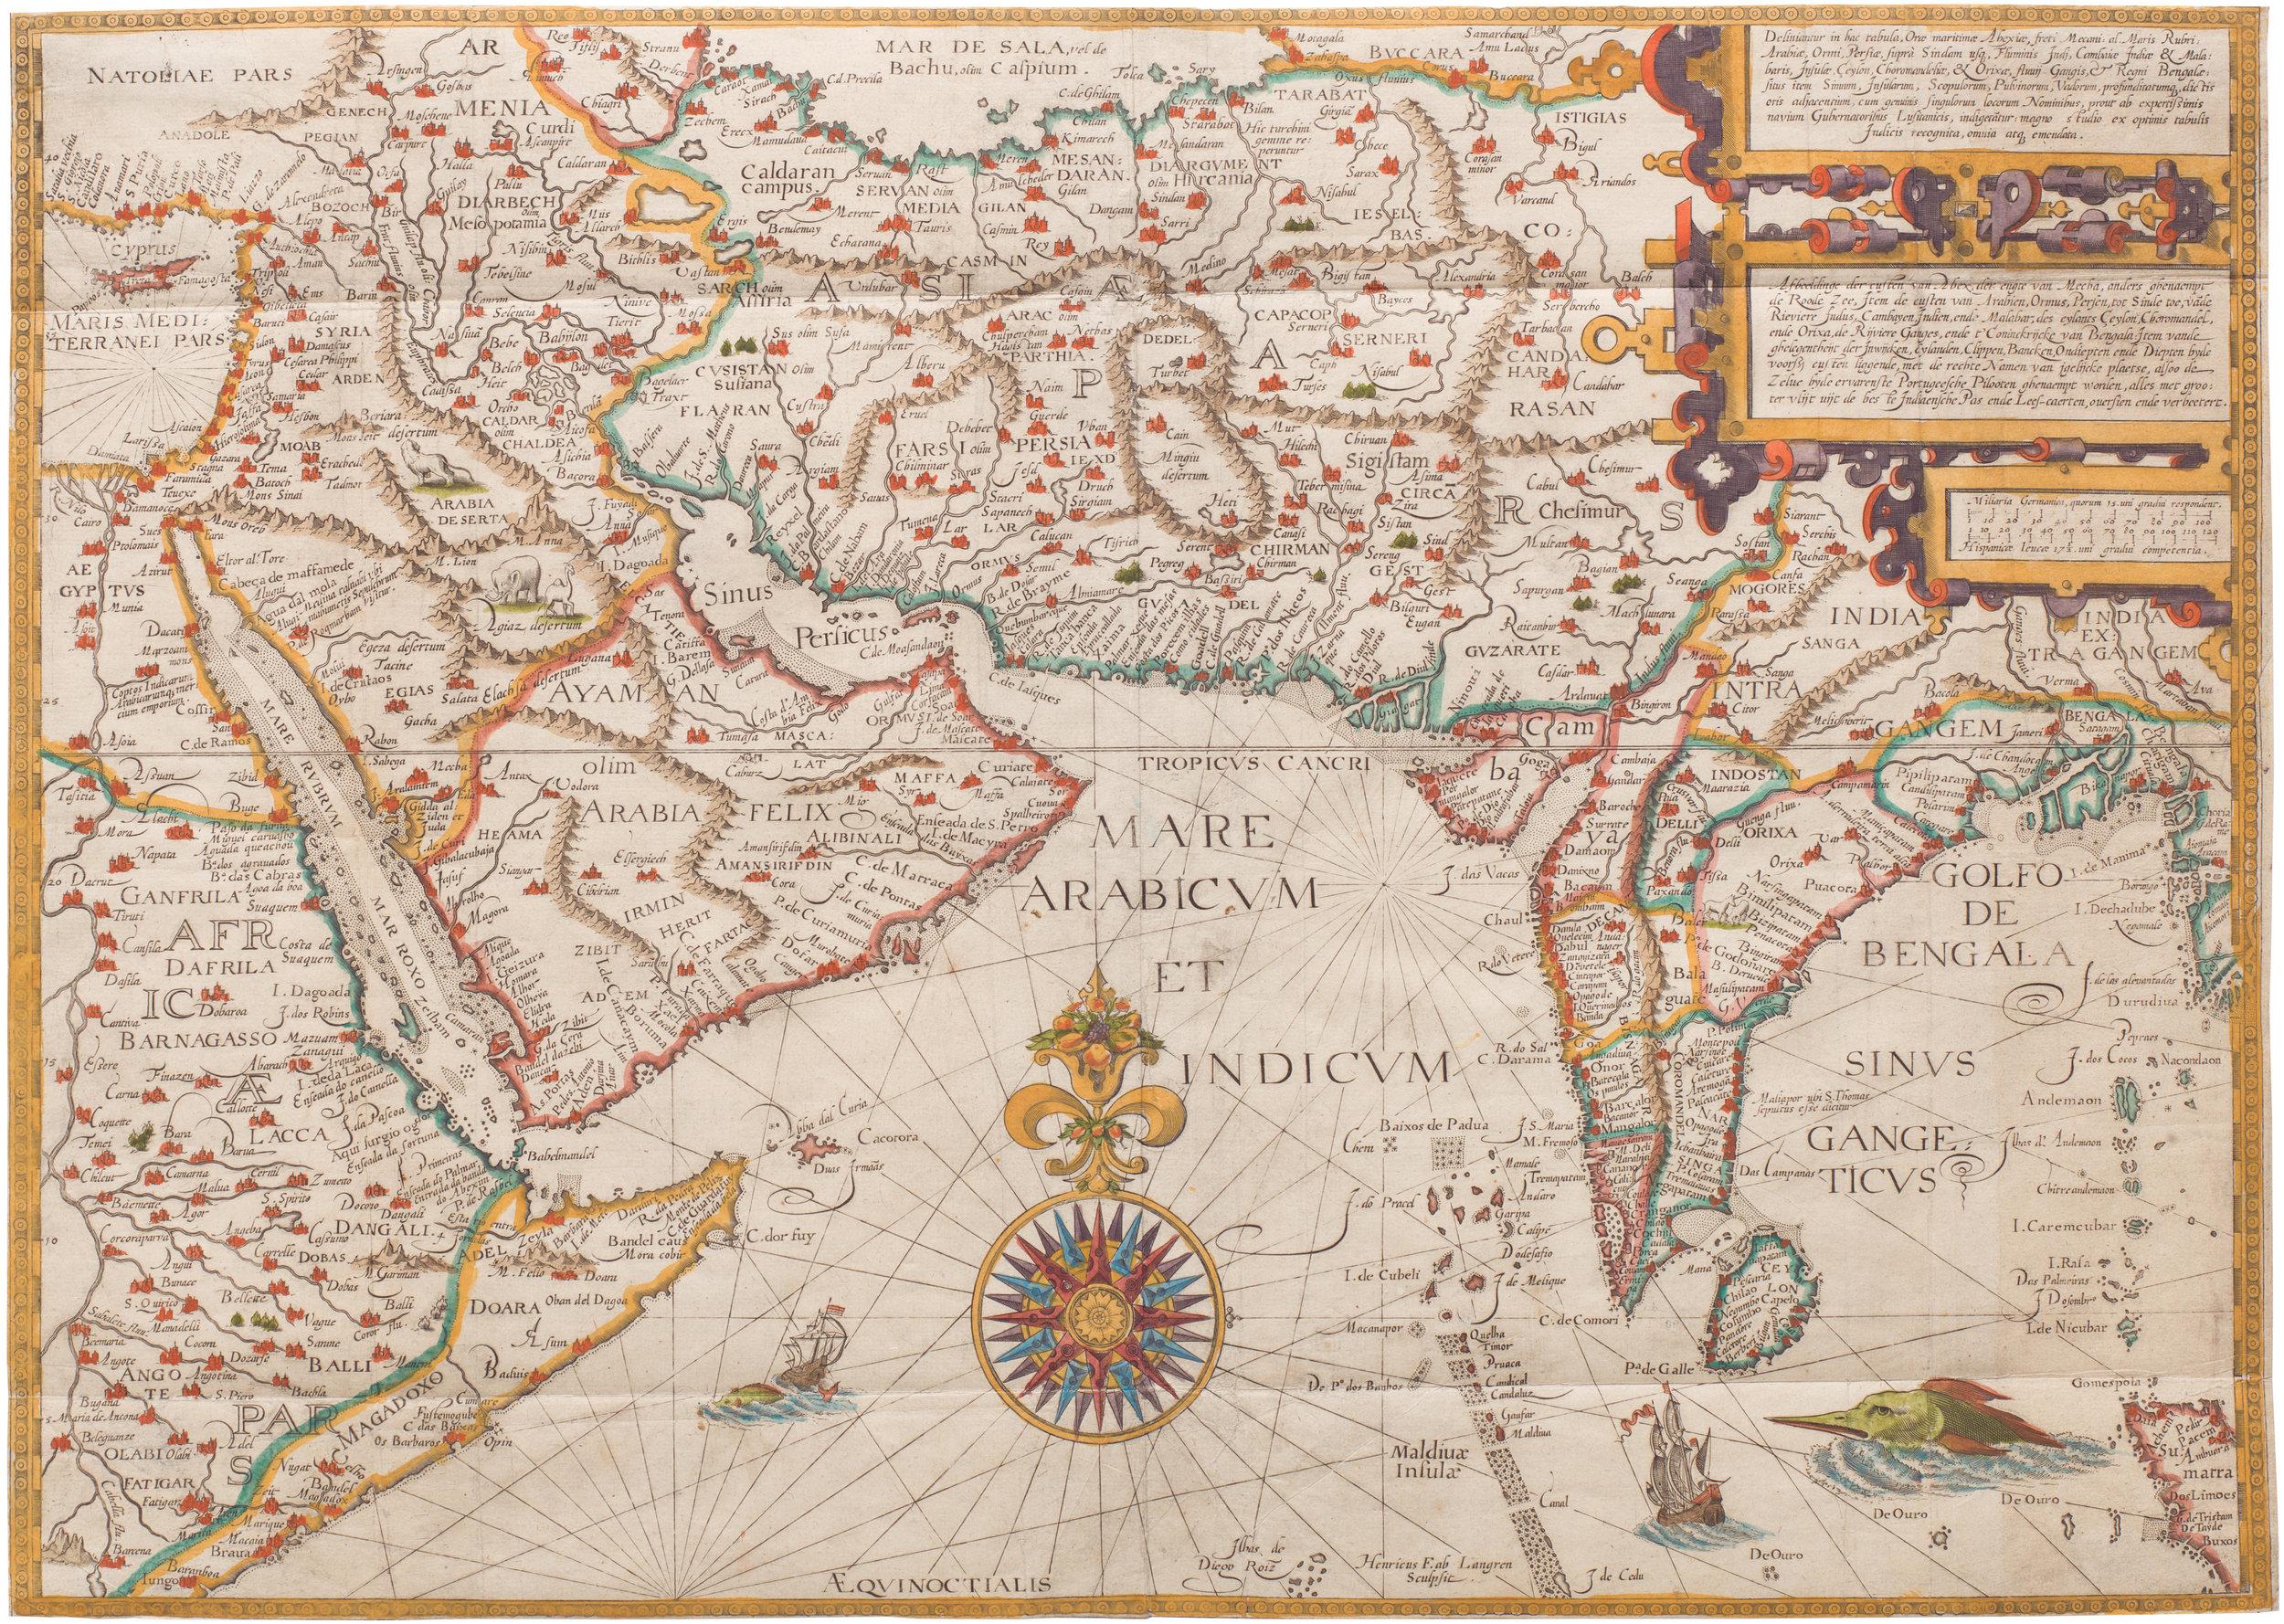 1596 - Linschoten